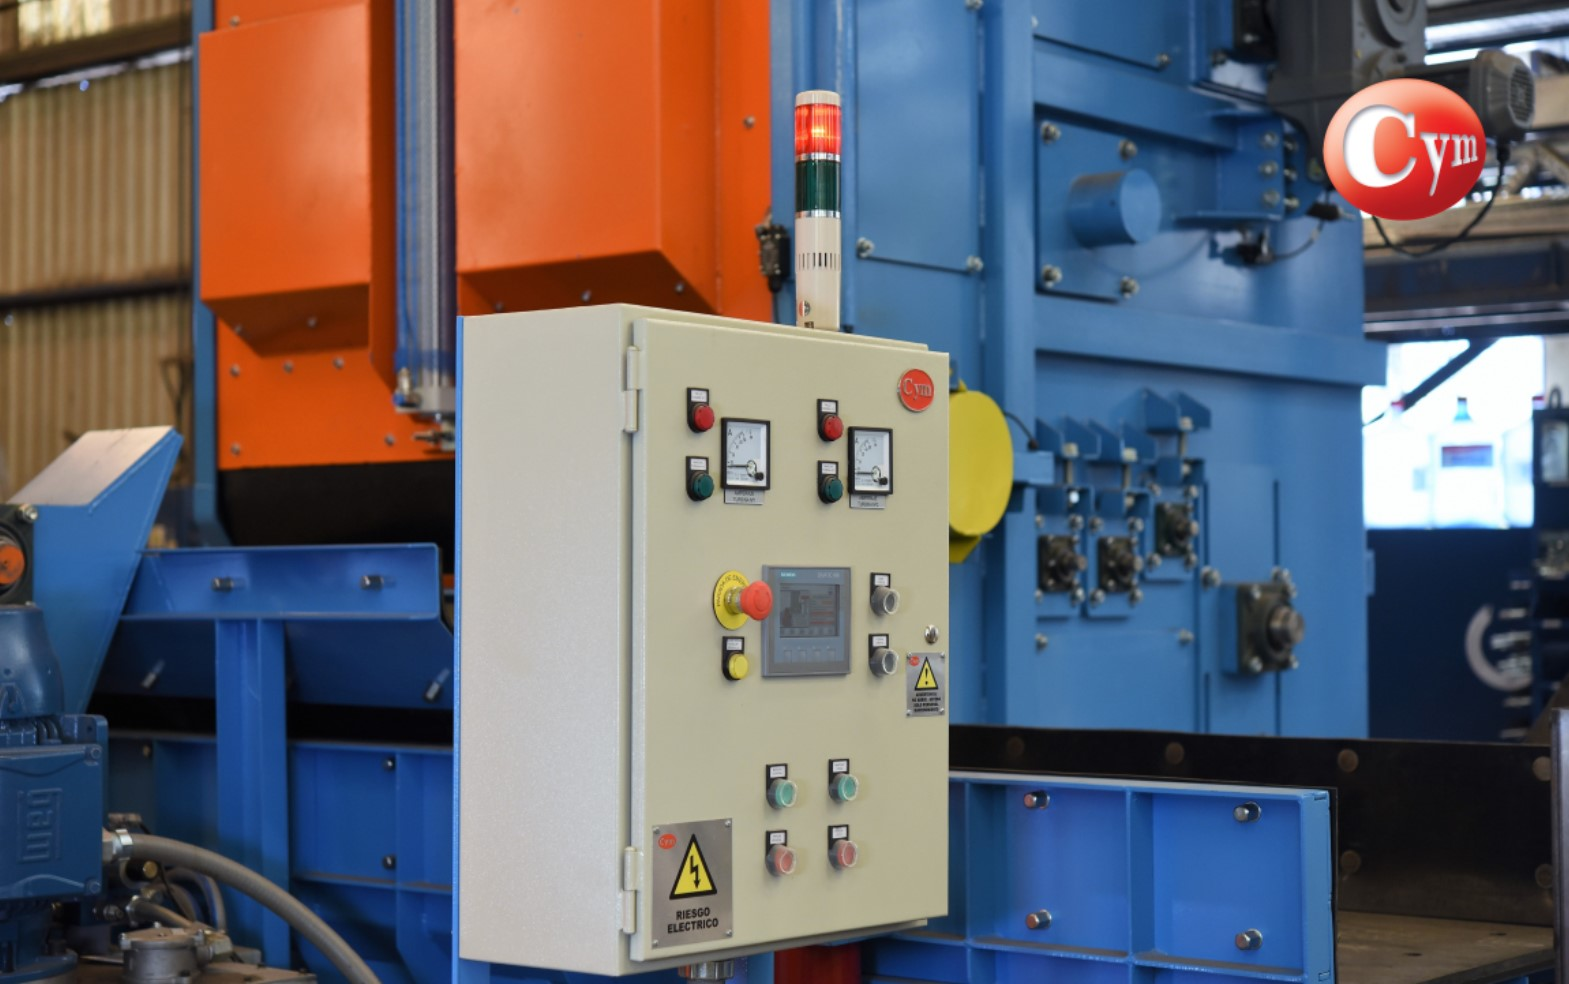 granalladora-de-cinta-rotativa-cym-lt600-crafmsa-cargador-de-capacho